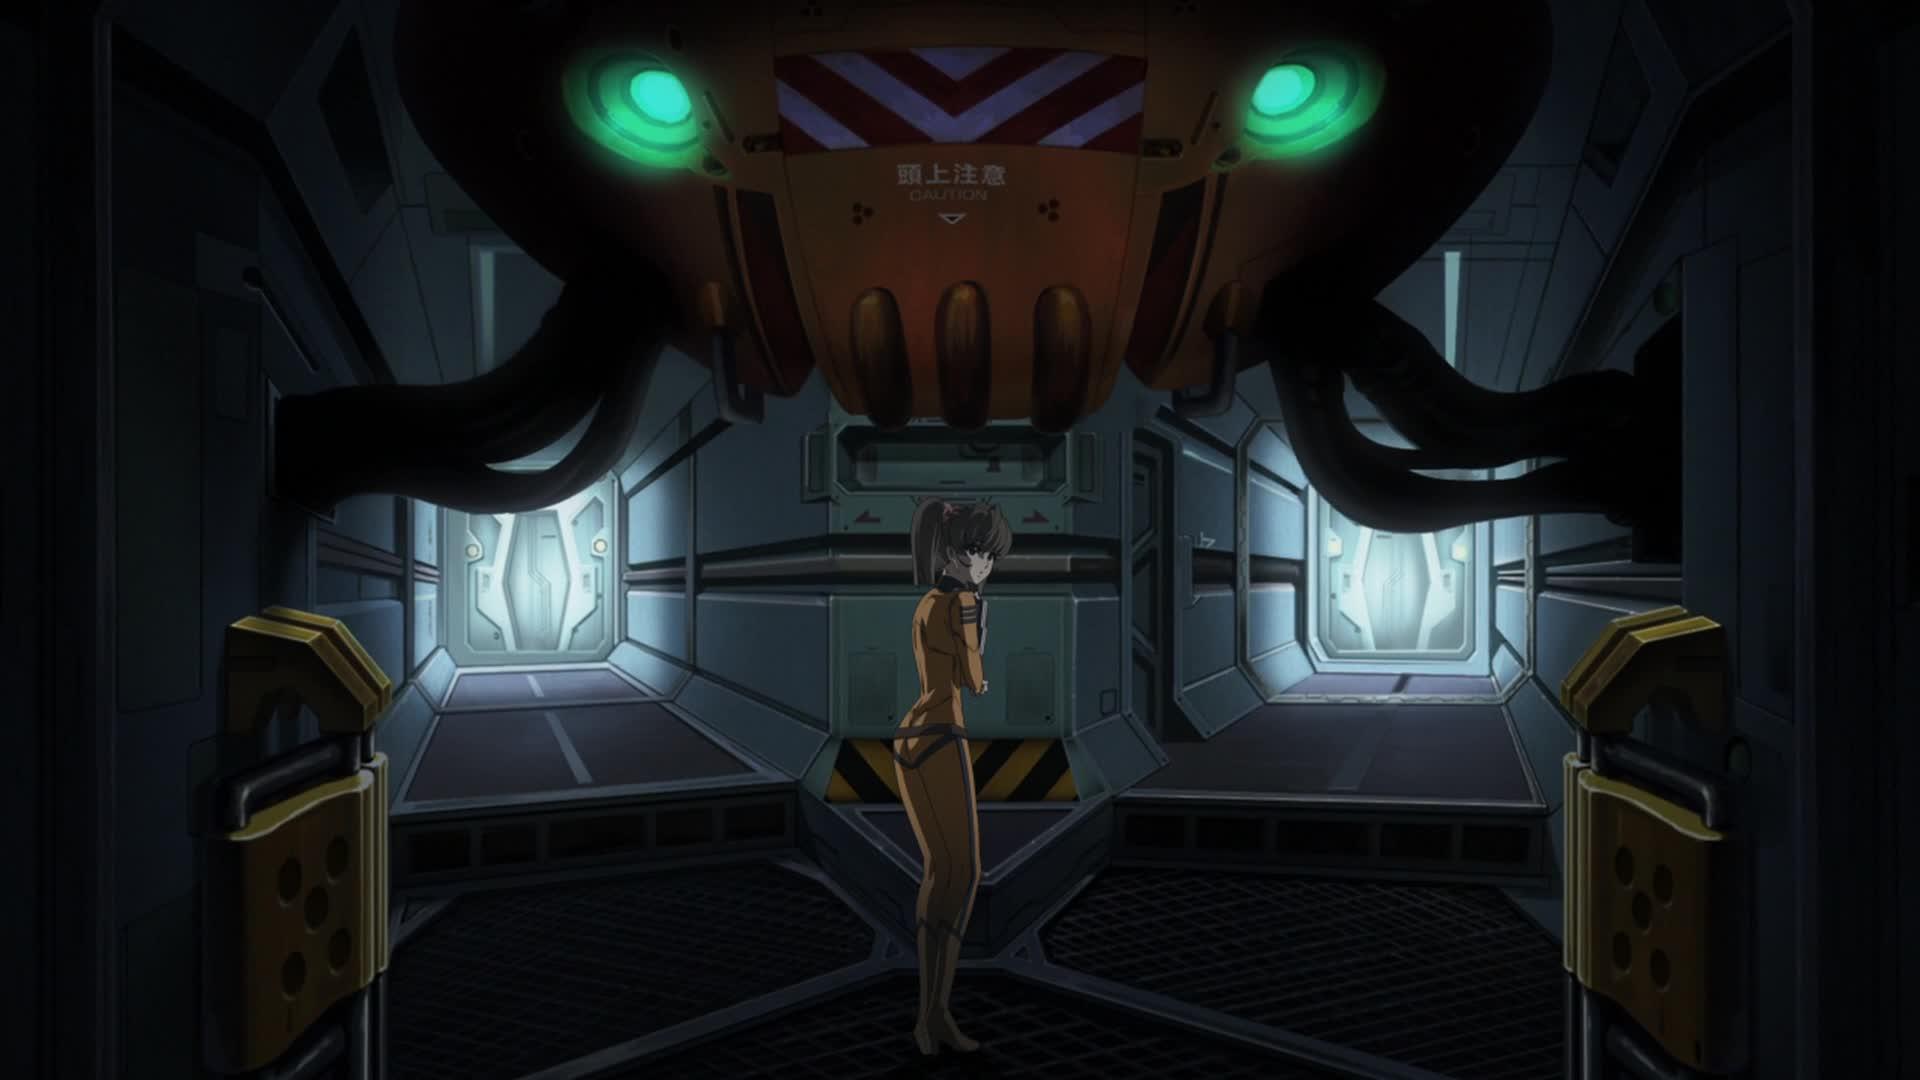 yamato 2199 episode 14 commentary cosmodna rh ourstarblazers com